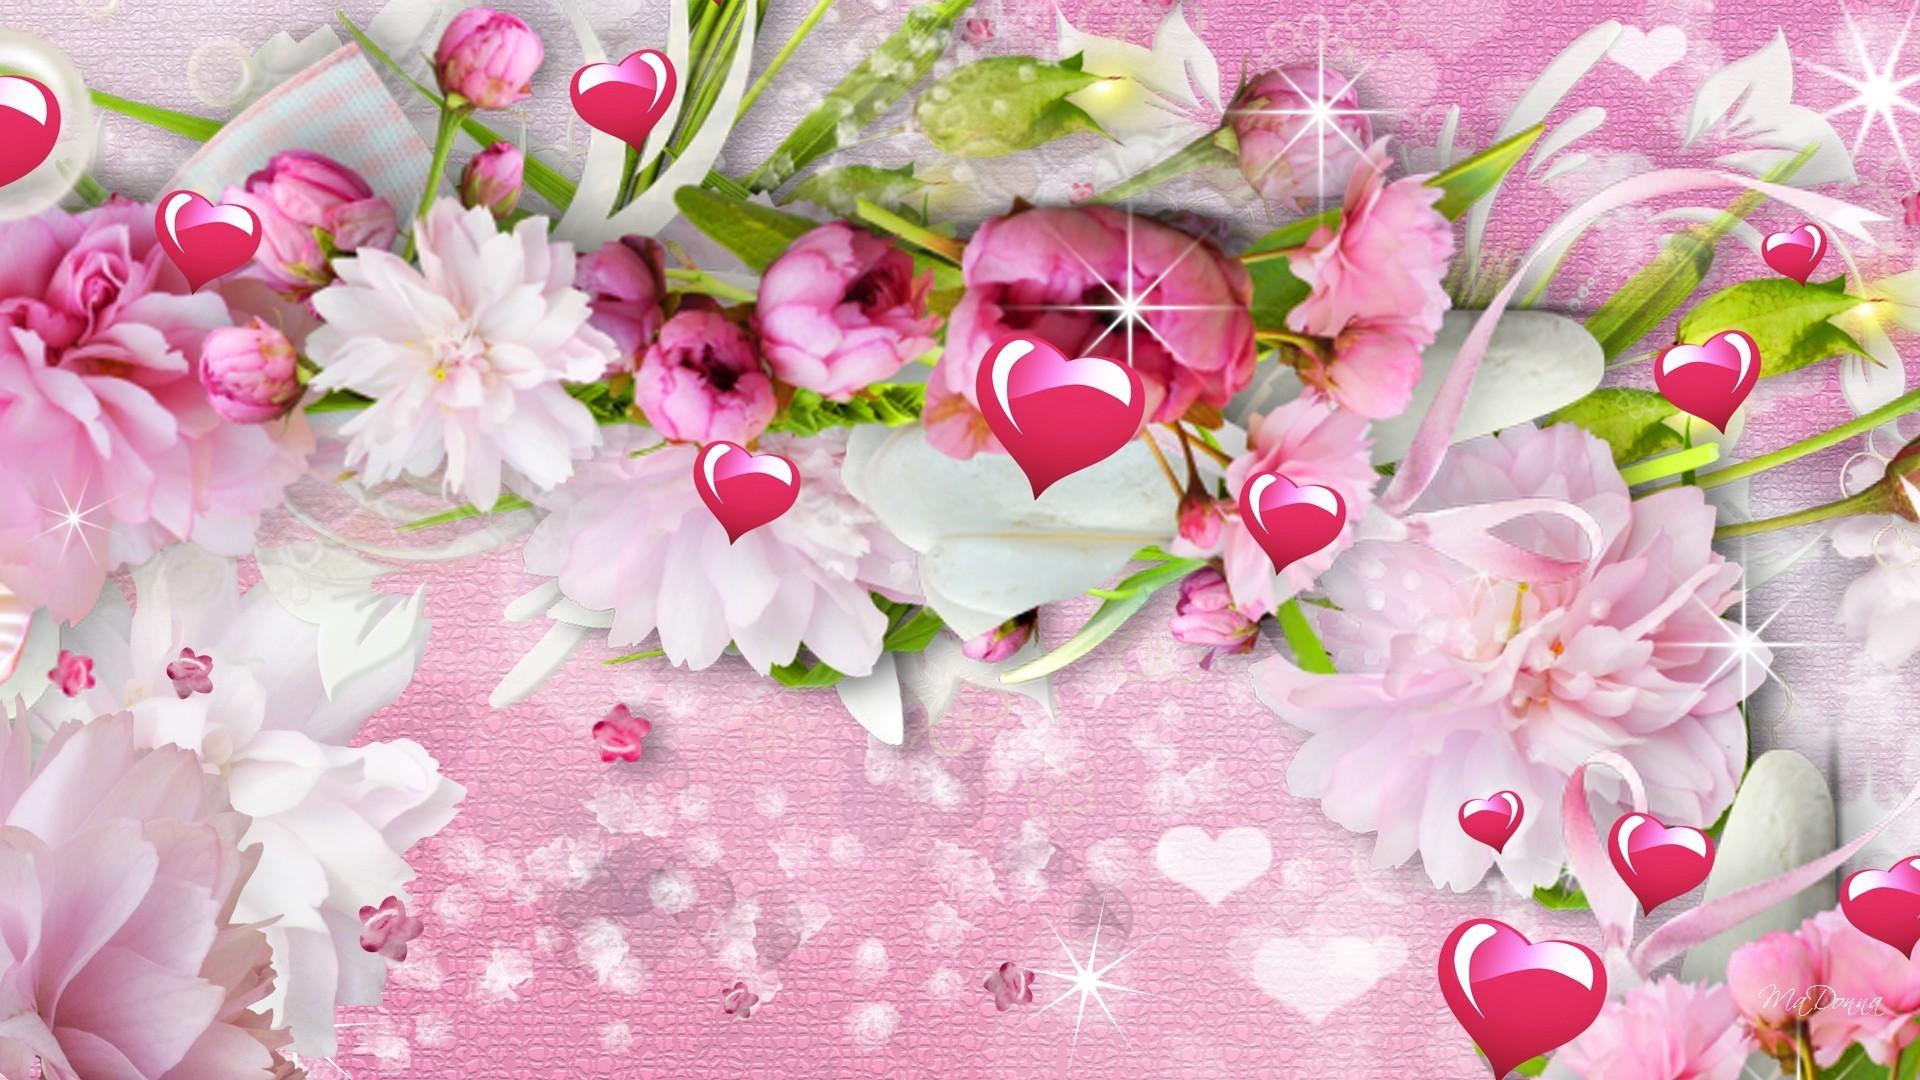 Flowers Spring Pink Stars Sparkle Valentines Day Hearts Peonies Summer  Jasmine Flower Wallpaper Desktop